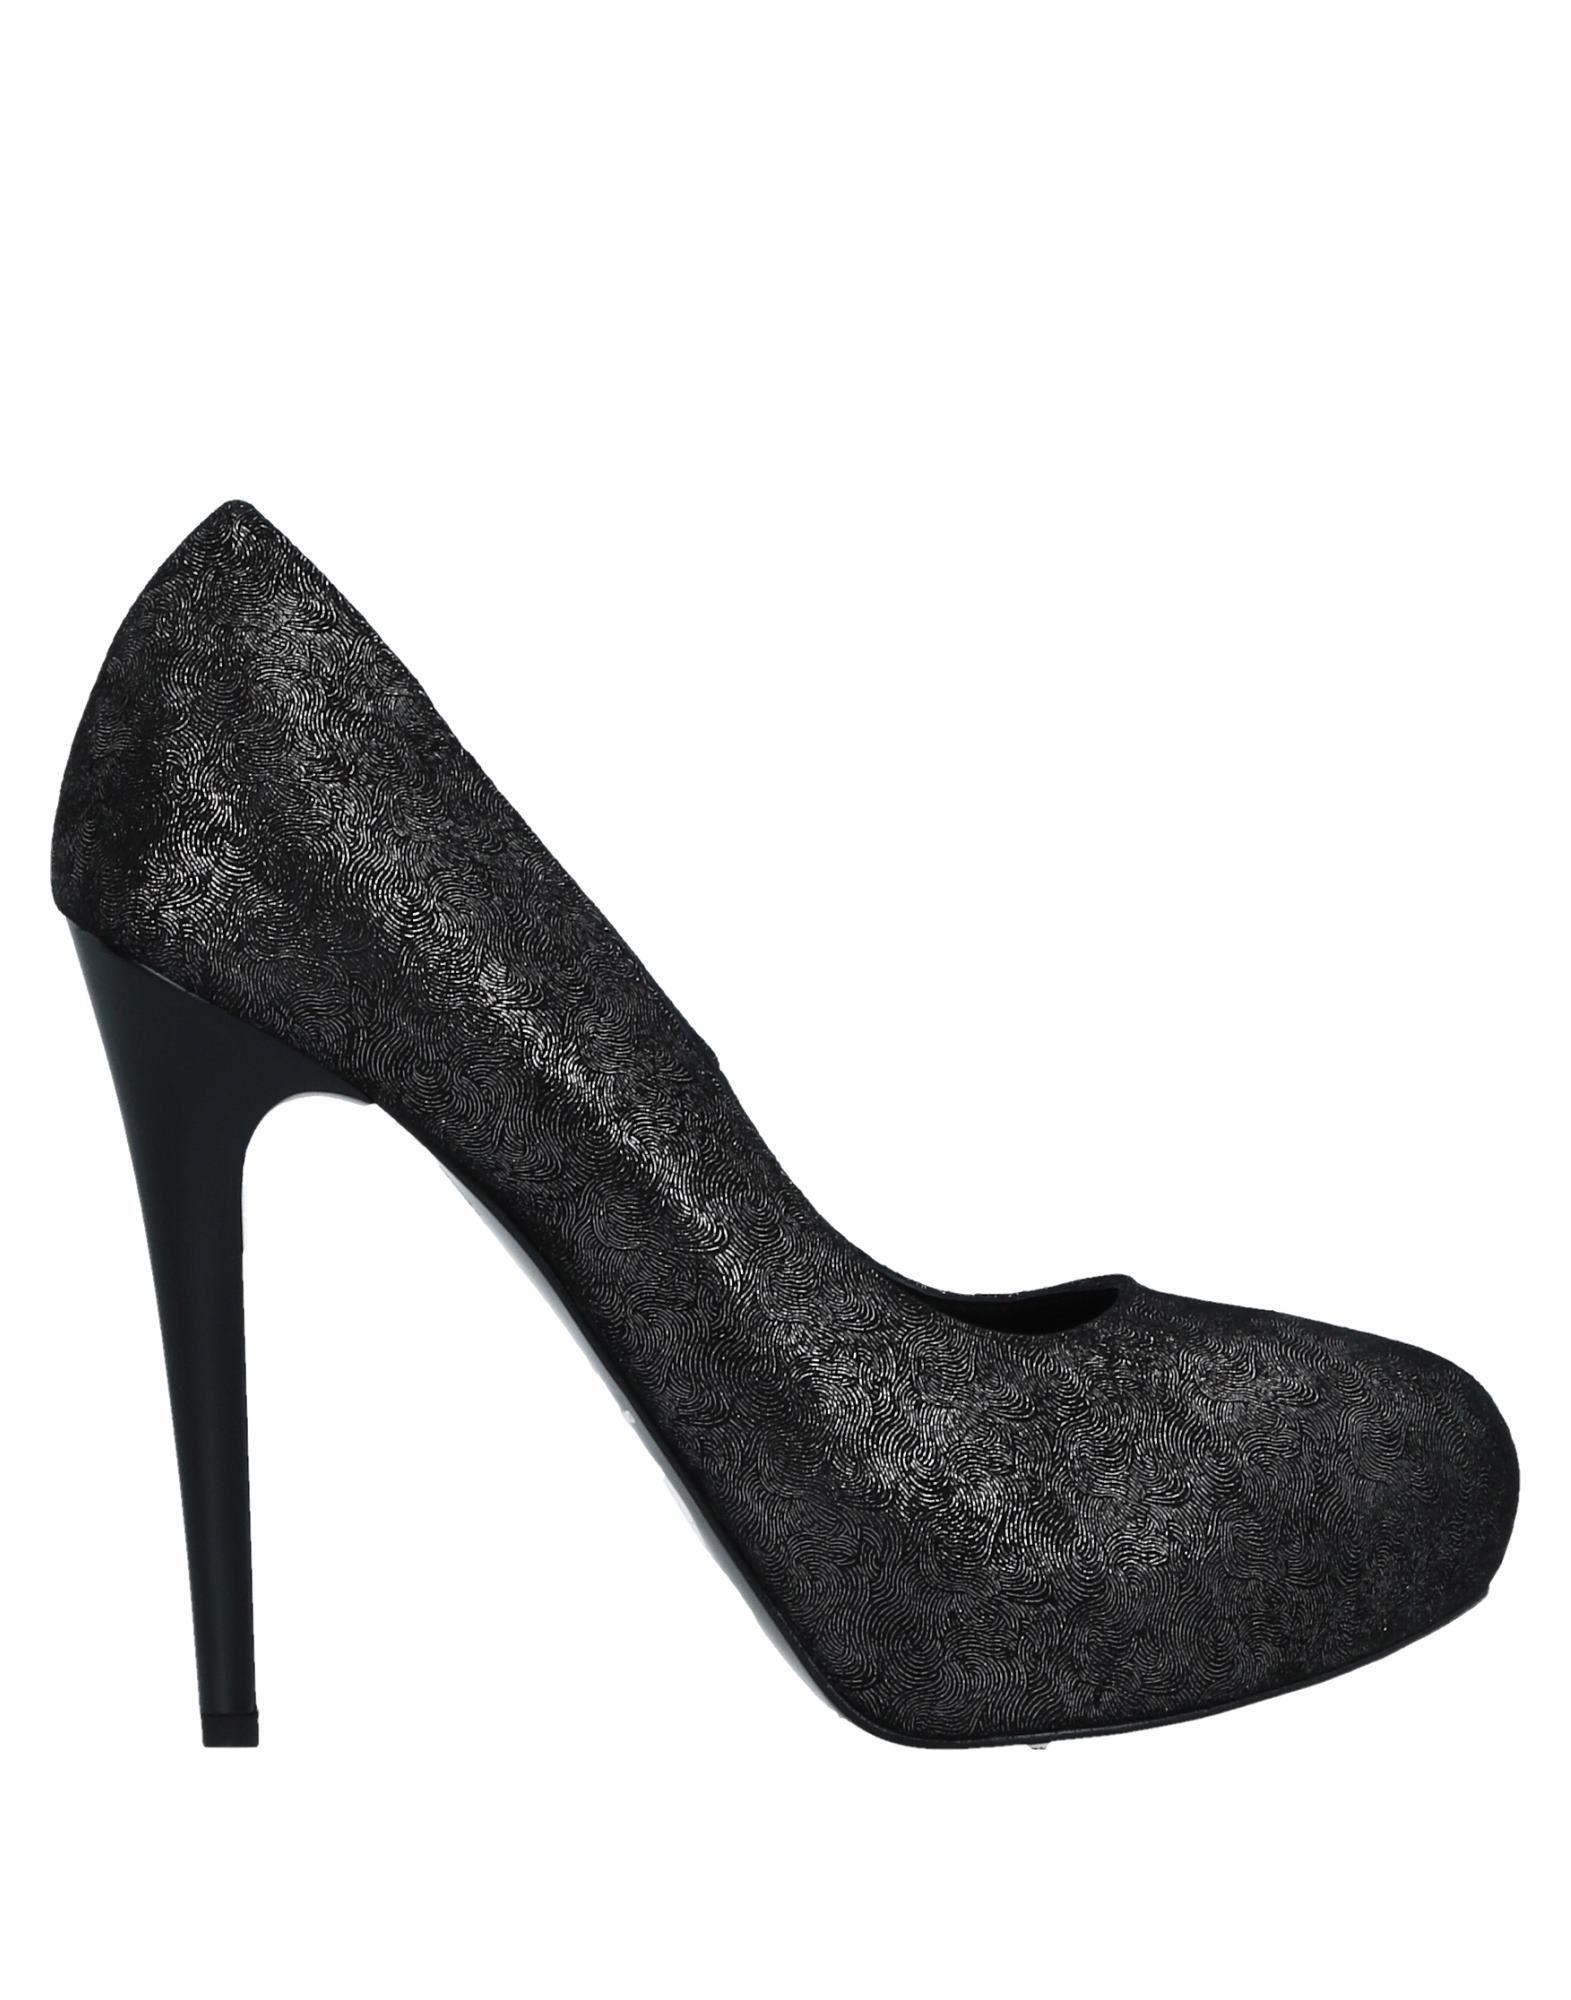 Stilvolle billige Pumps Schuhe Sgn Giancarlo Paoli Pumps billige Damen  11522786MK 7db6de